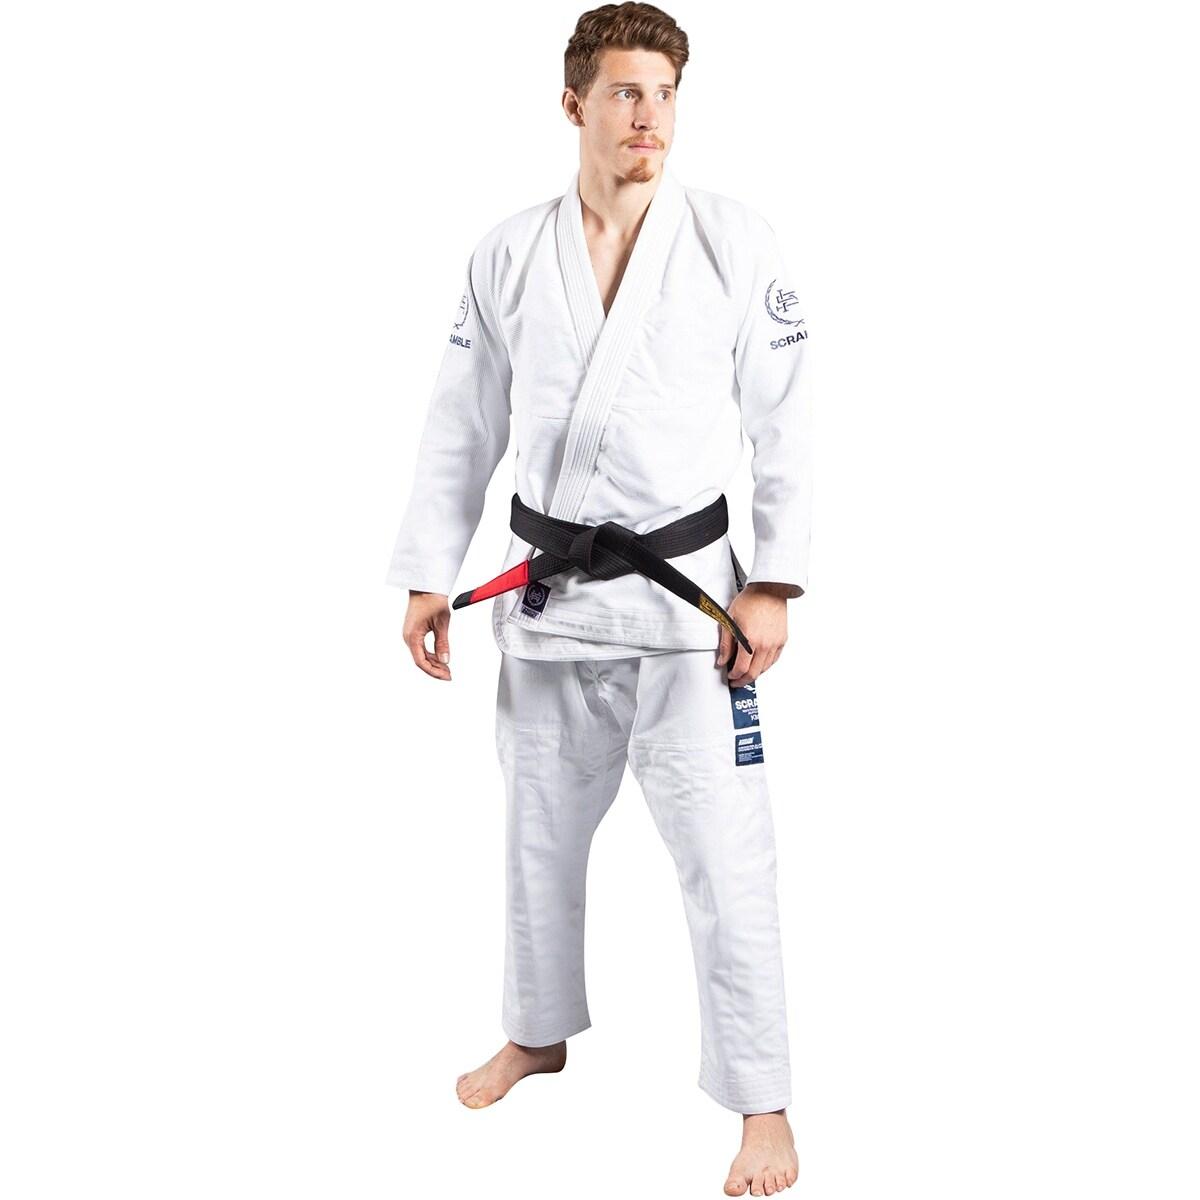 Scramble New Wave Brazilian Jiu-Jitsu Gi White